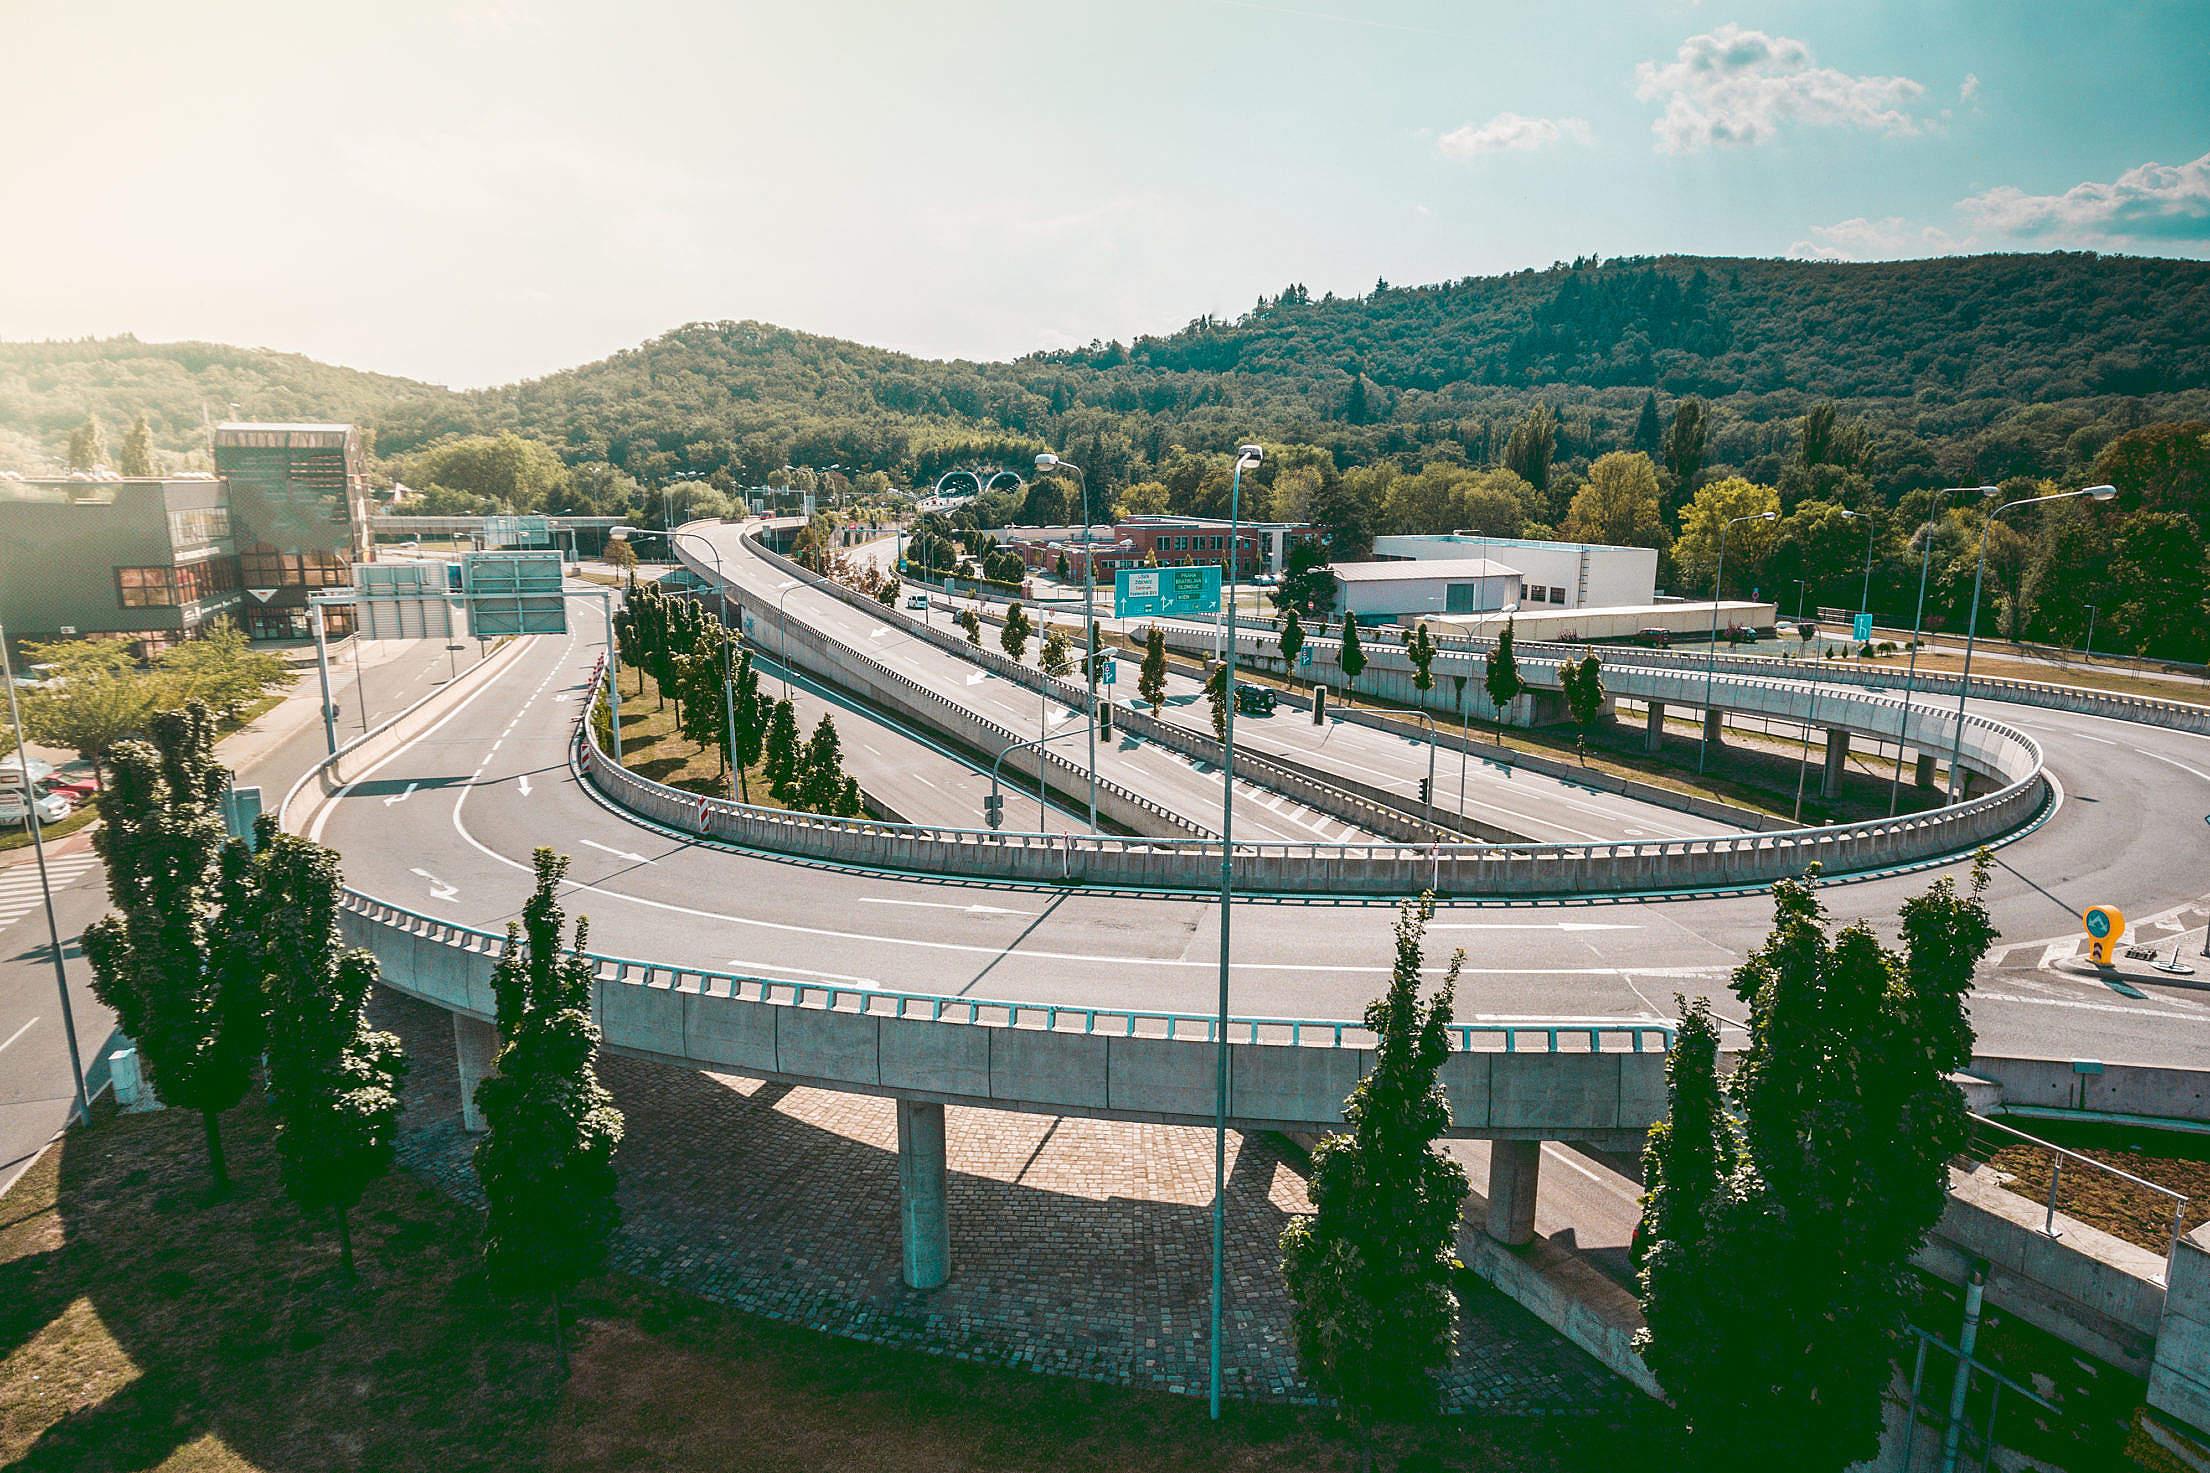 Two Level Road Interchange Free Stock Photo